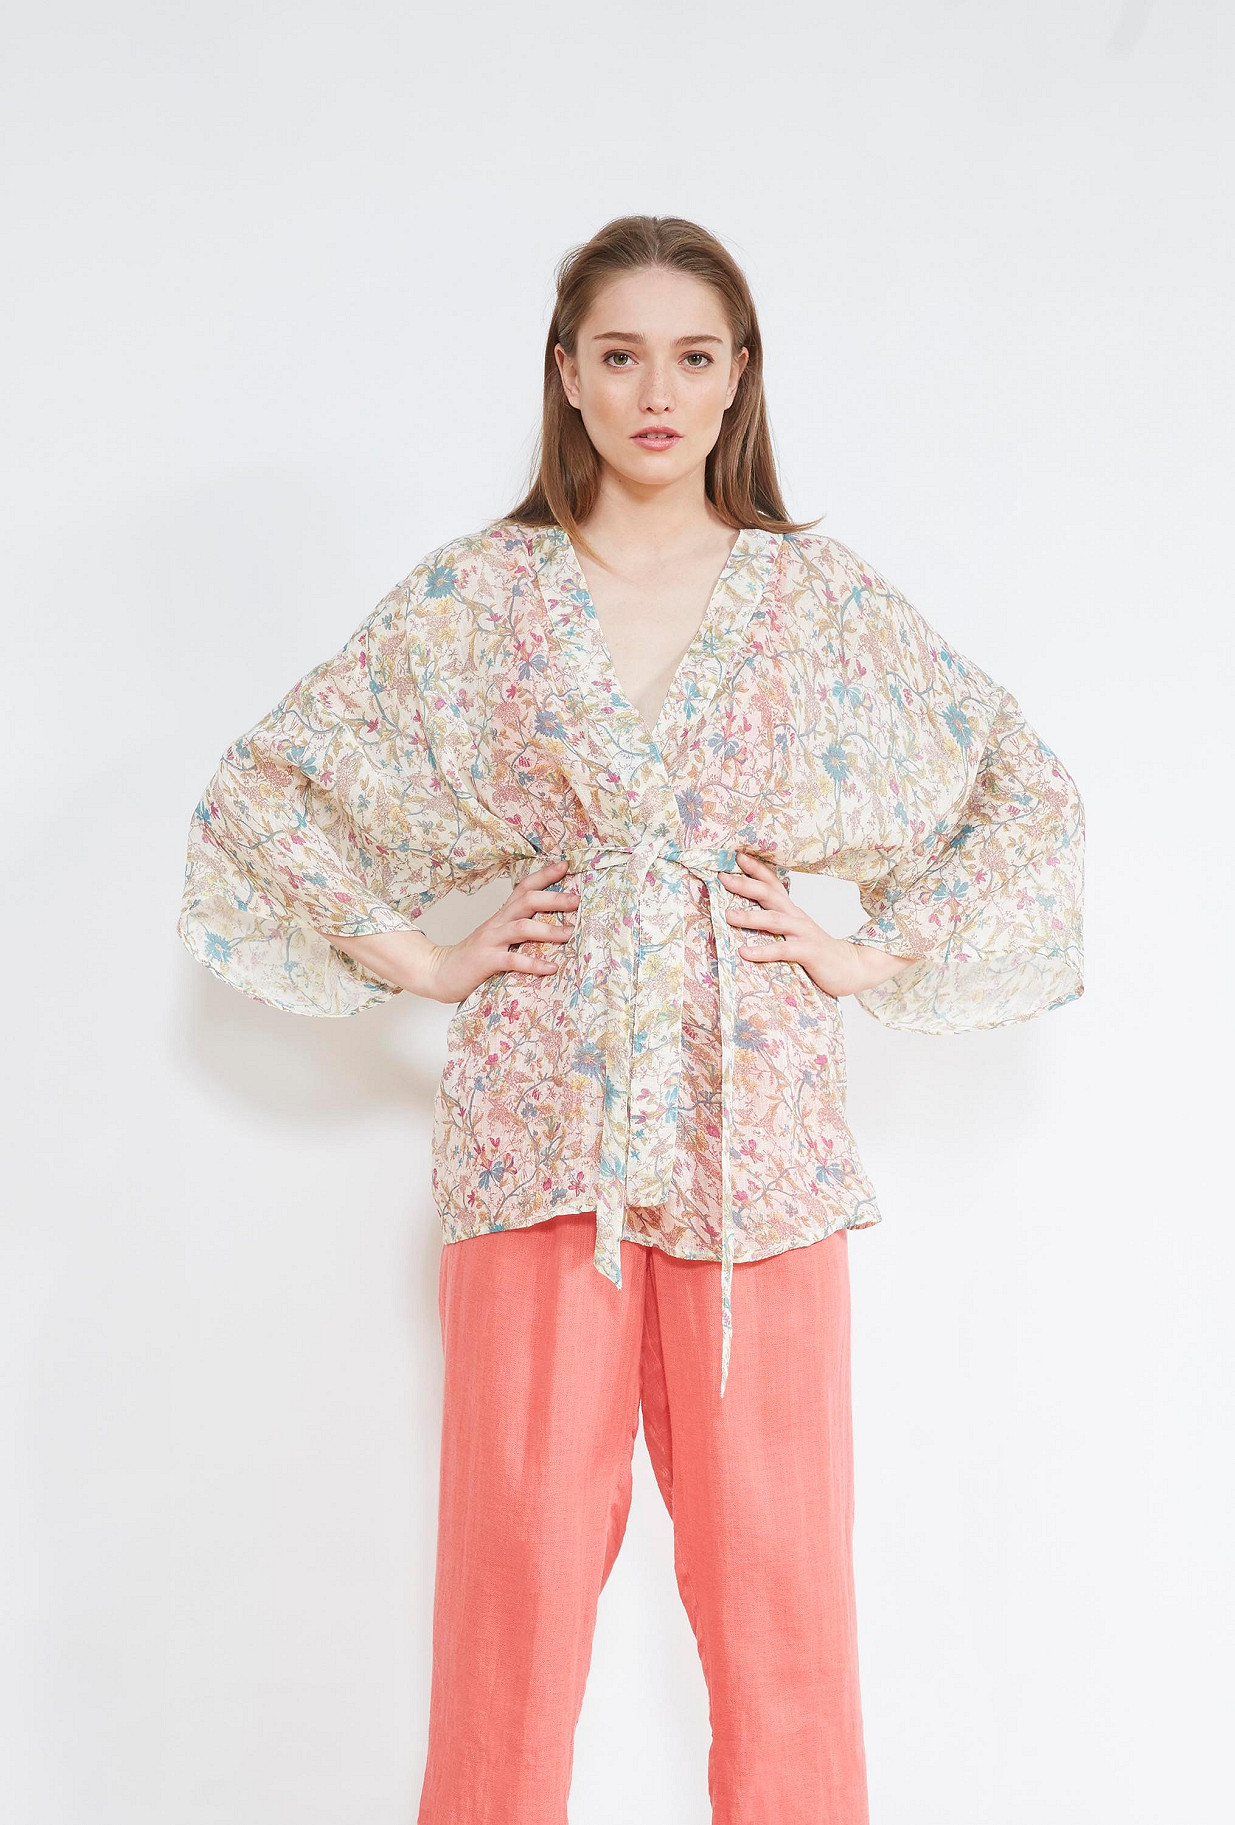 Floral print  KIMONO  Tilde Mes demoiselles fashion clothes designer Paris